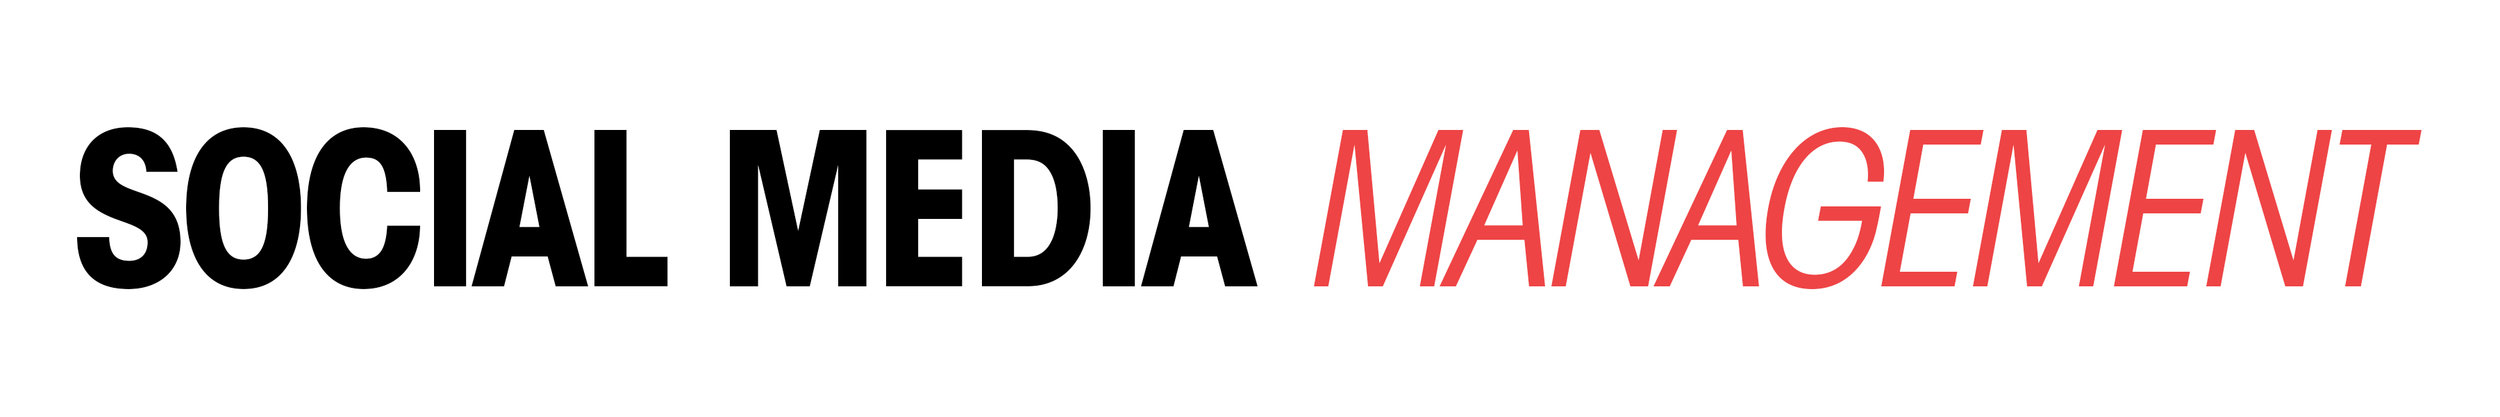 Social Media Management Services.jpg